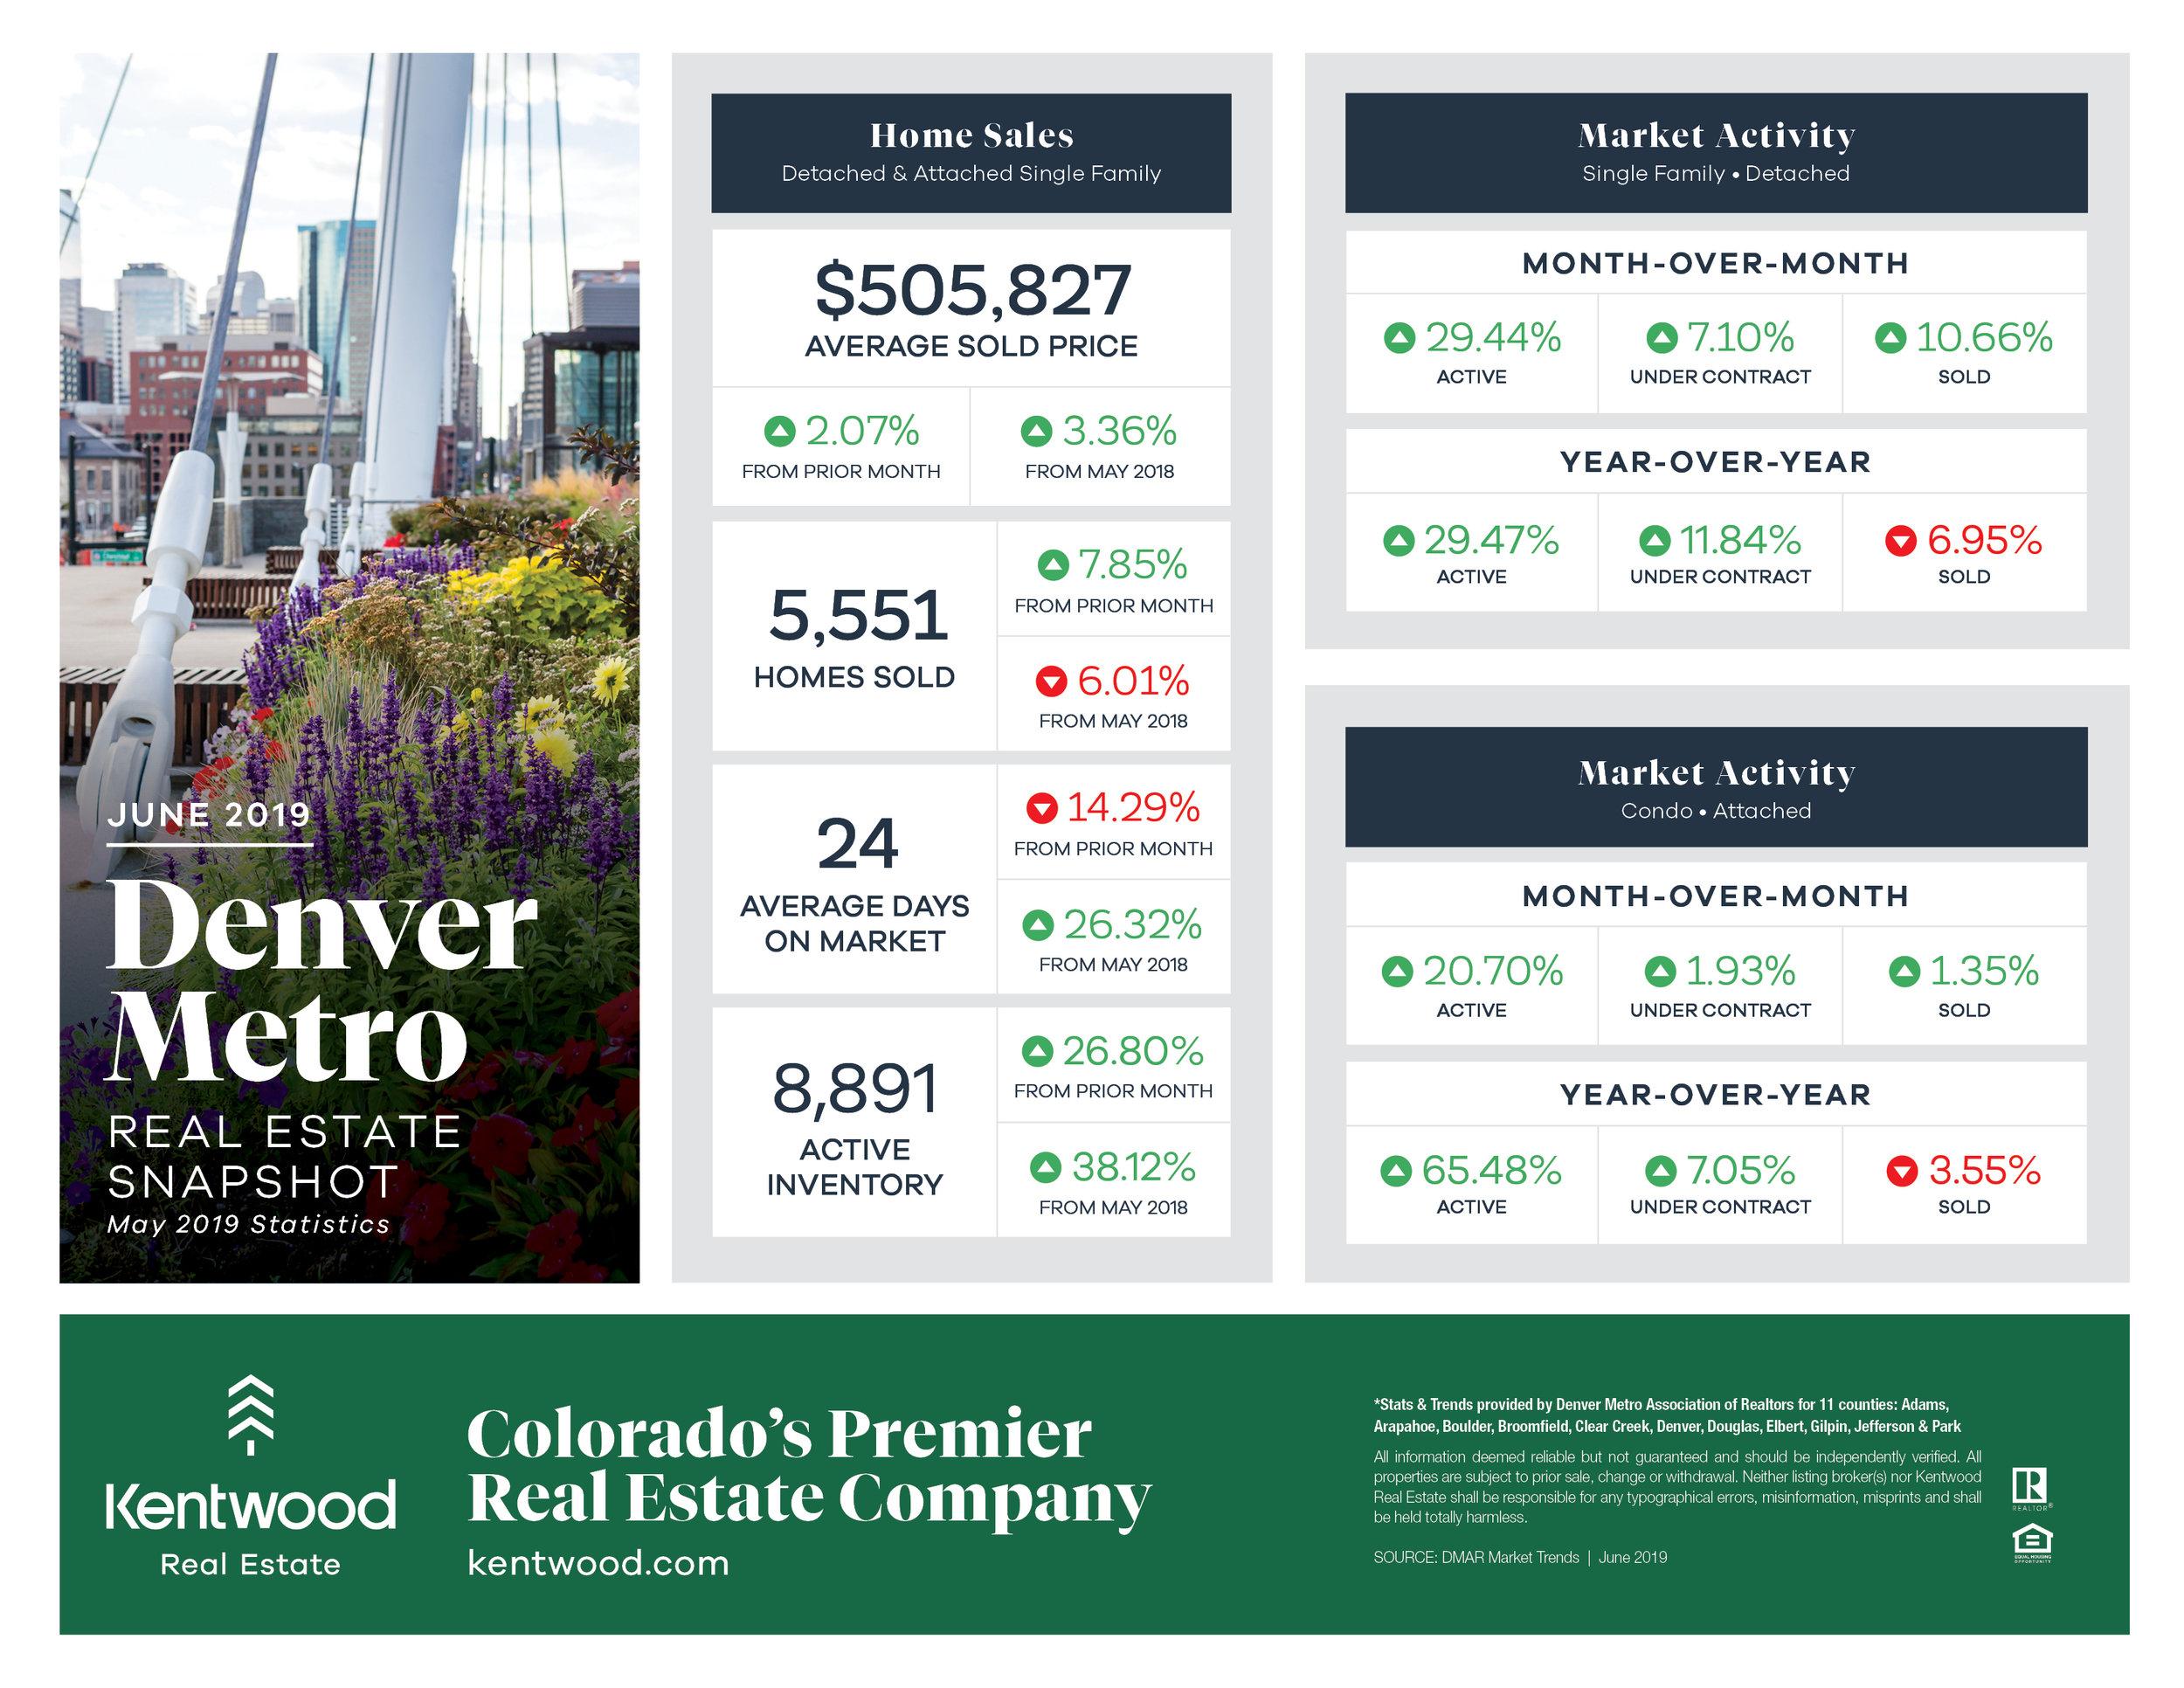 June_Denver_Metro_StatsUpdatedBranding.jpg